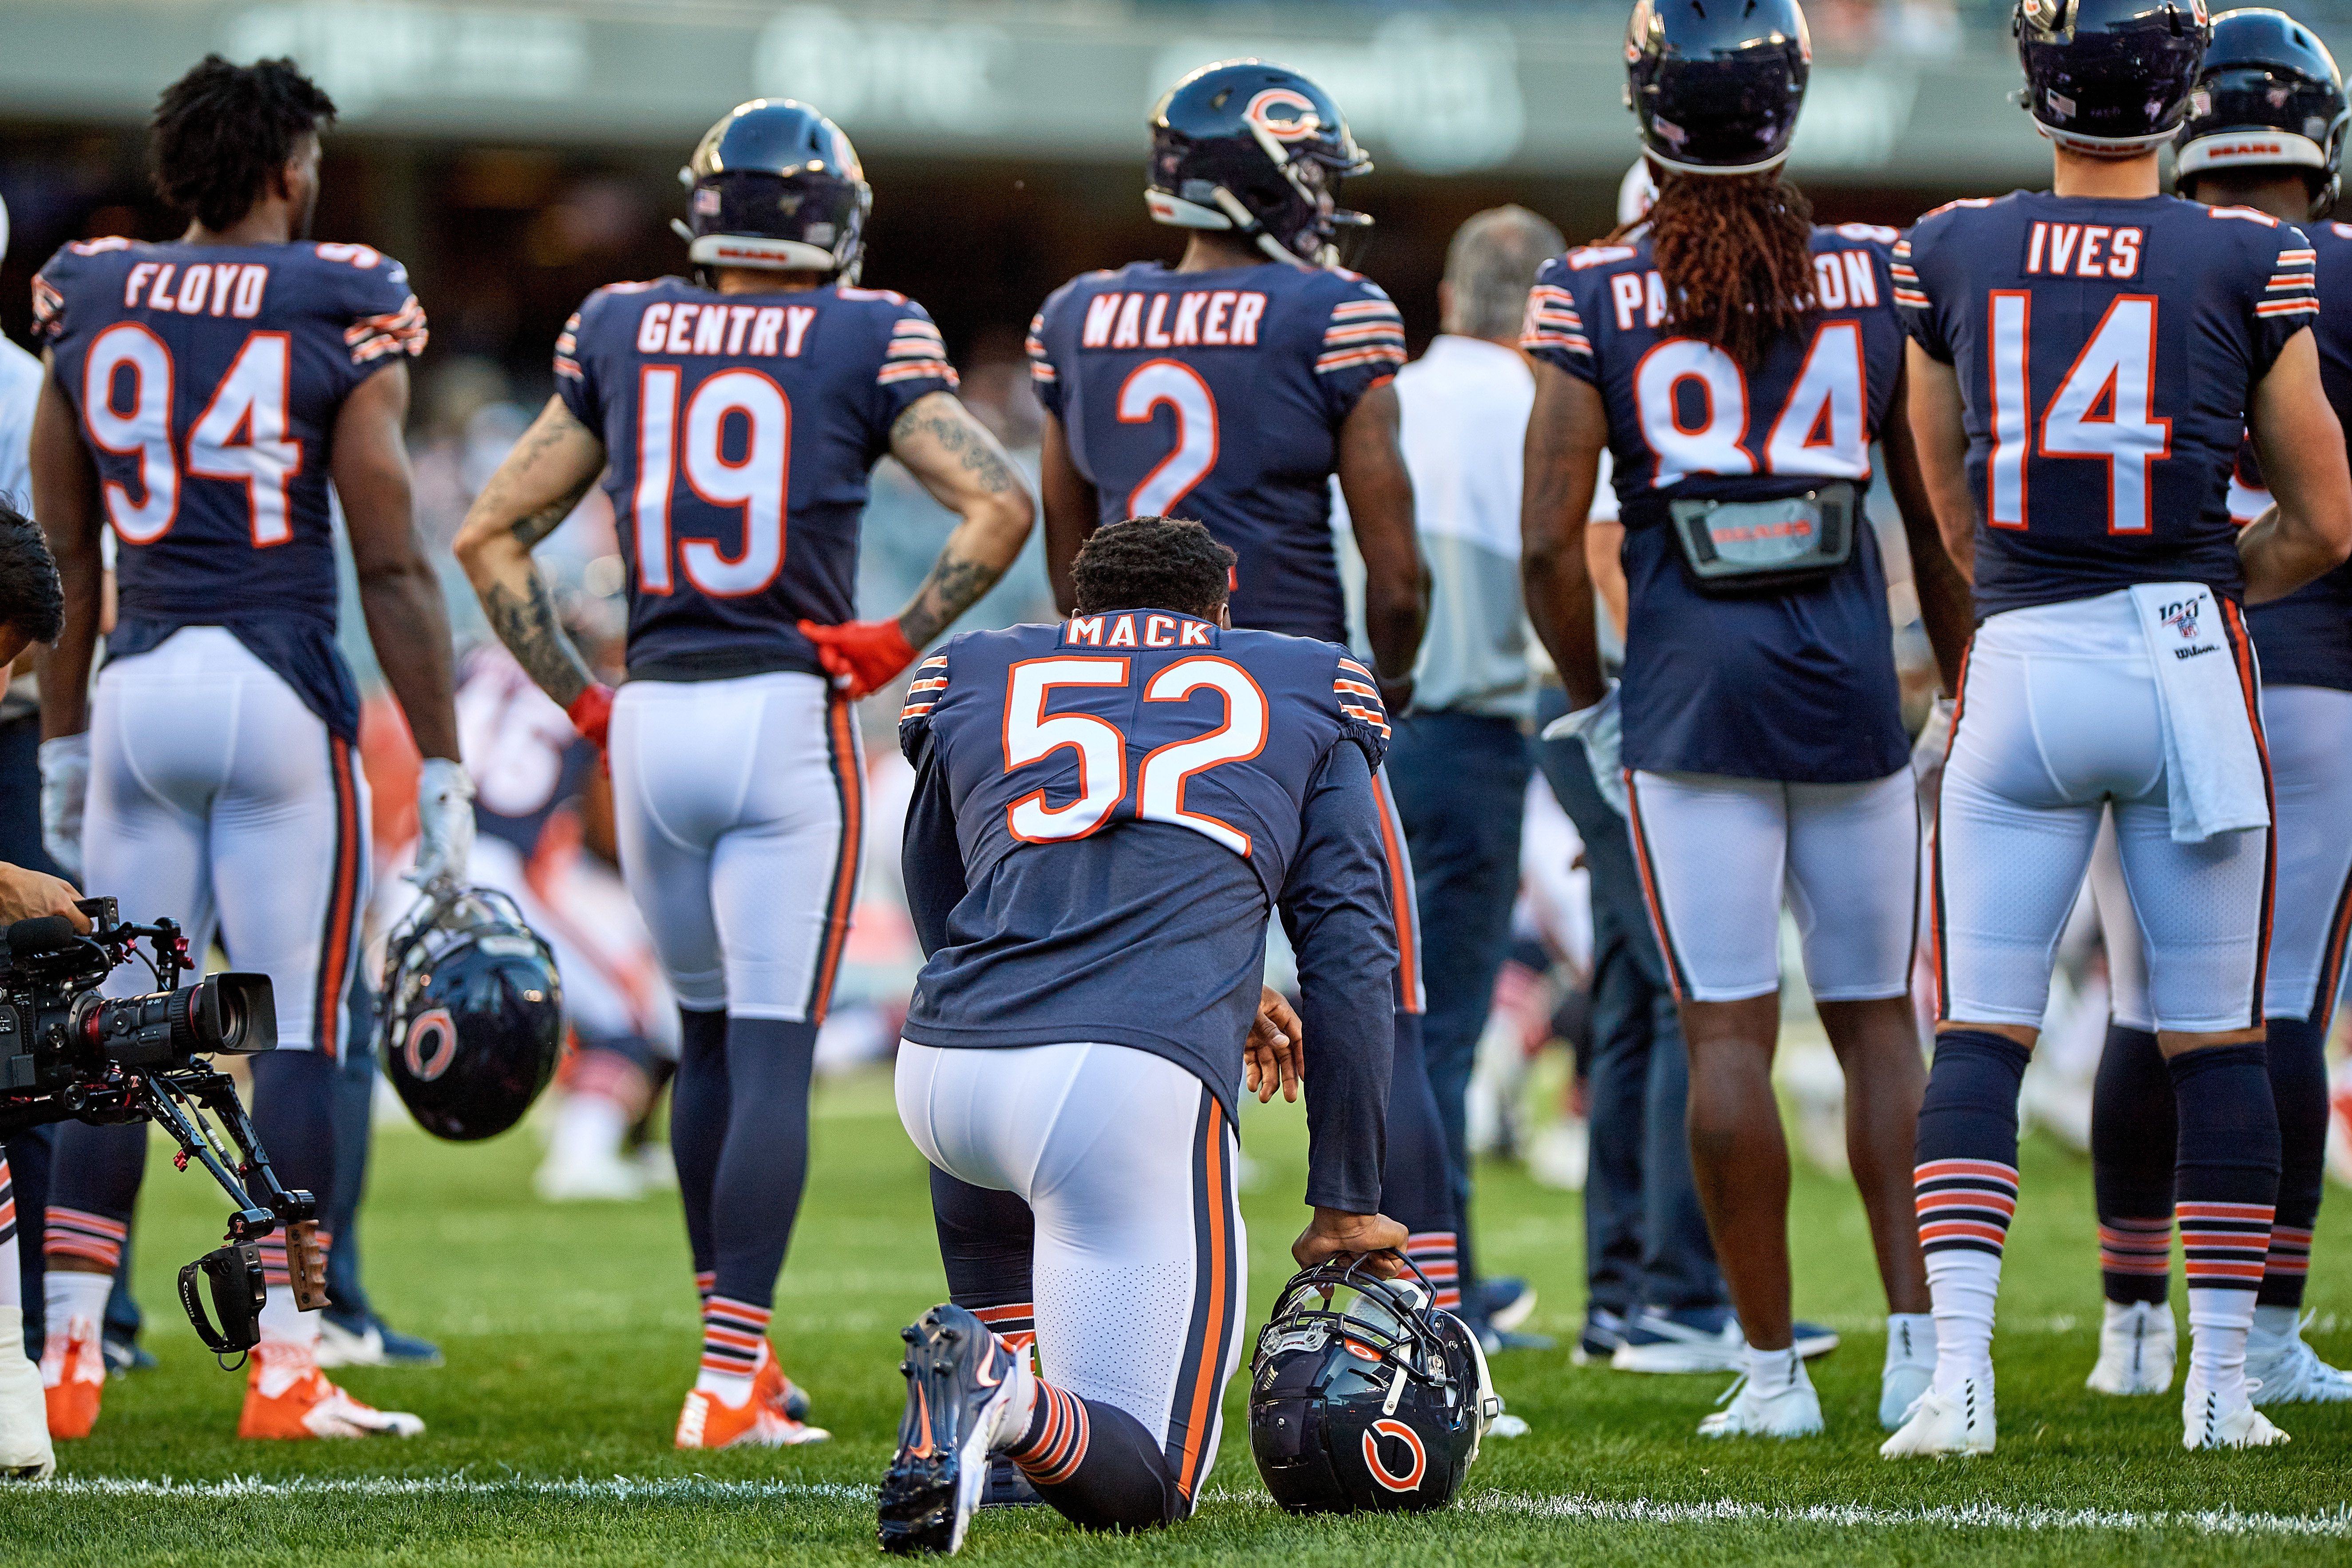 NFL: AUG 08 Preseason - Panthers at Bears